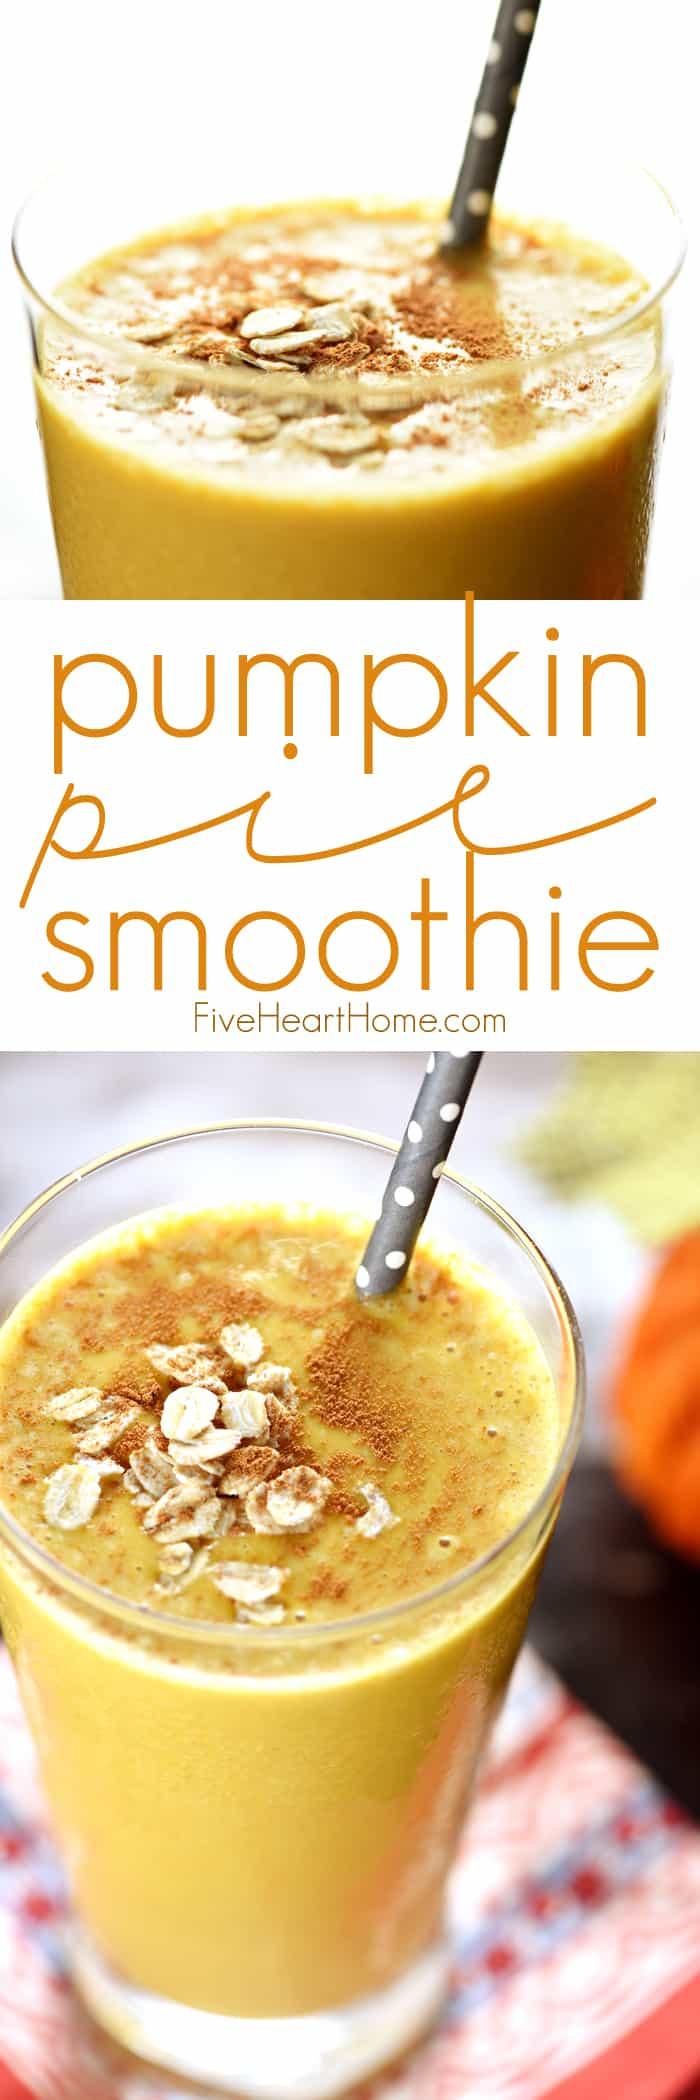 Pumpkin Breakfast Recipes  Pumpkin Pie Smoothies Healthy Oat Smoothies